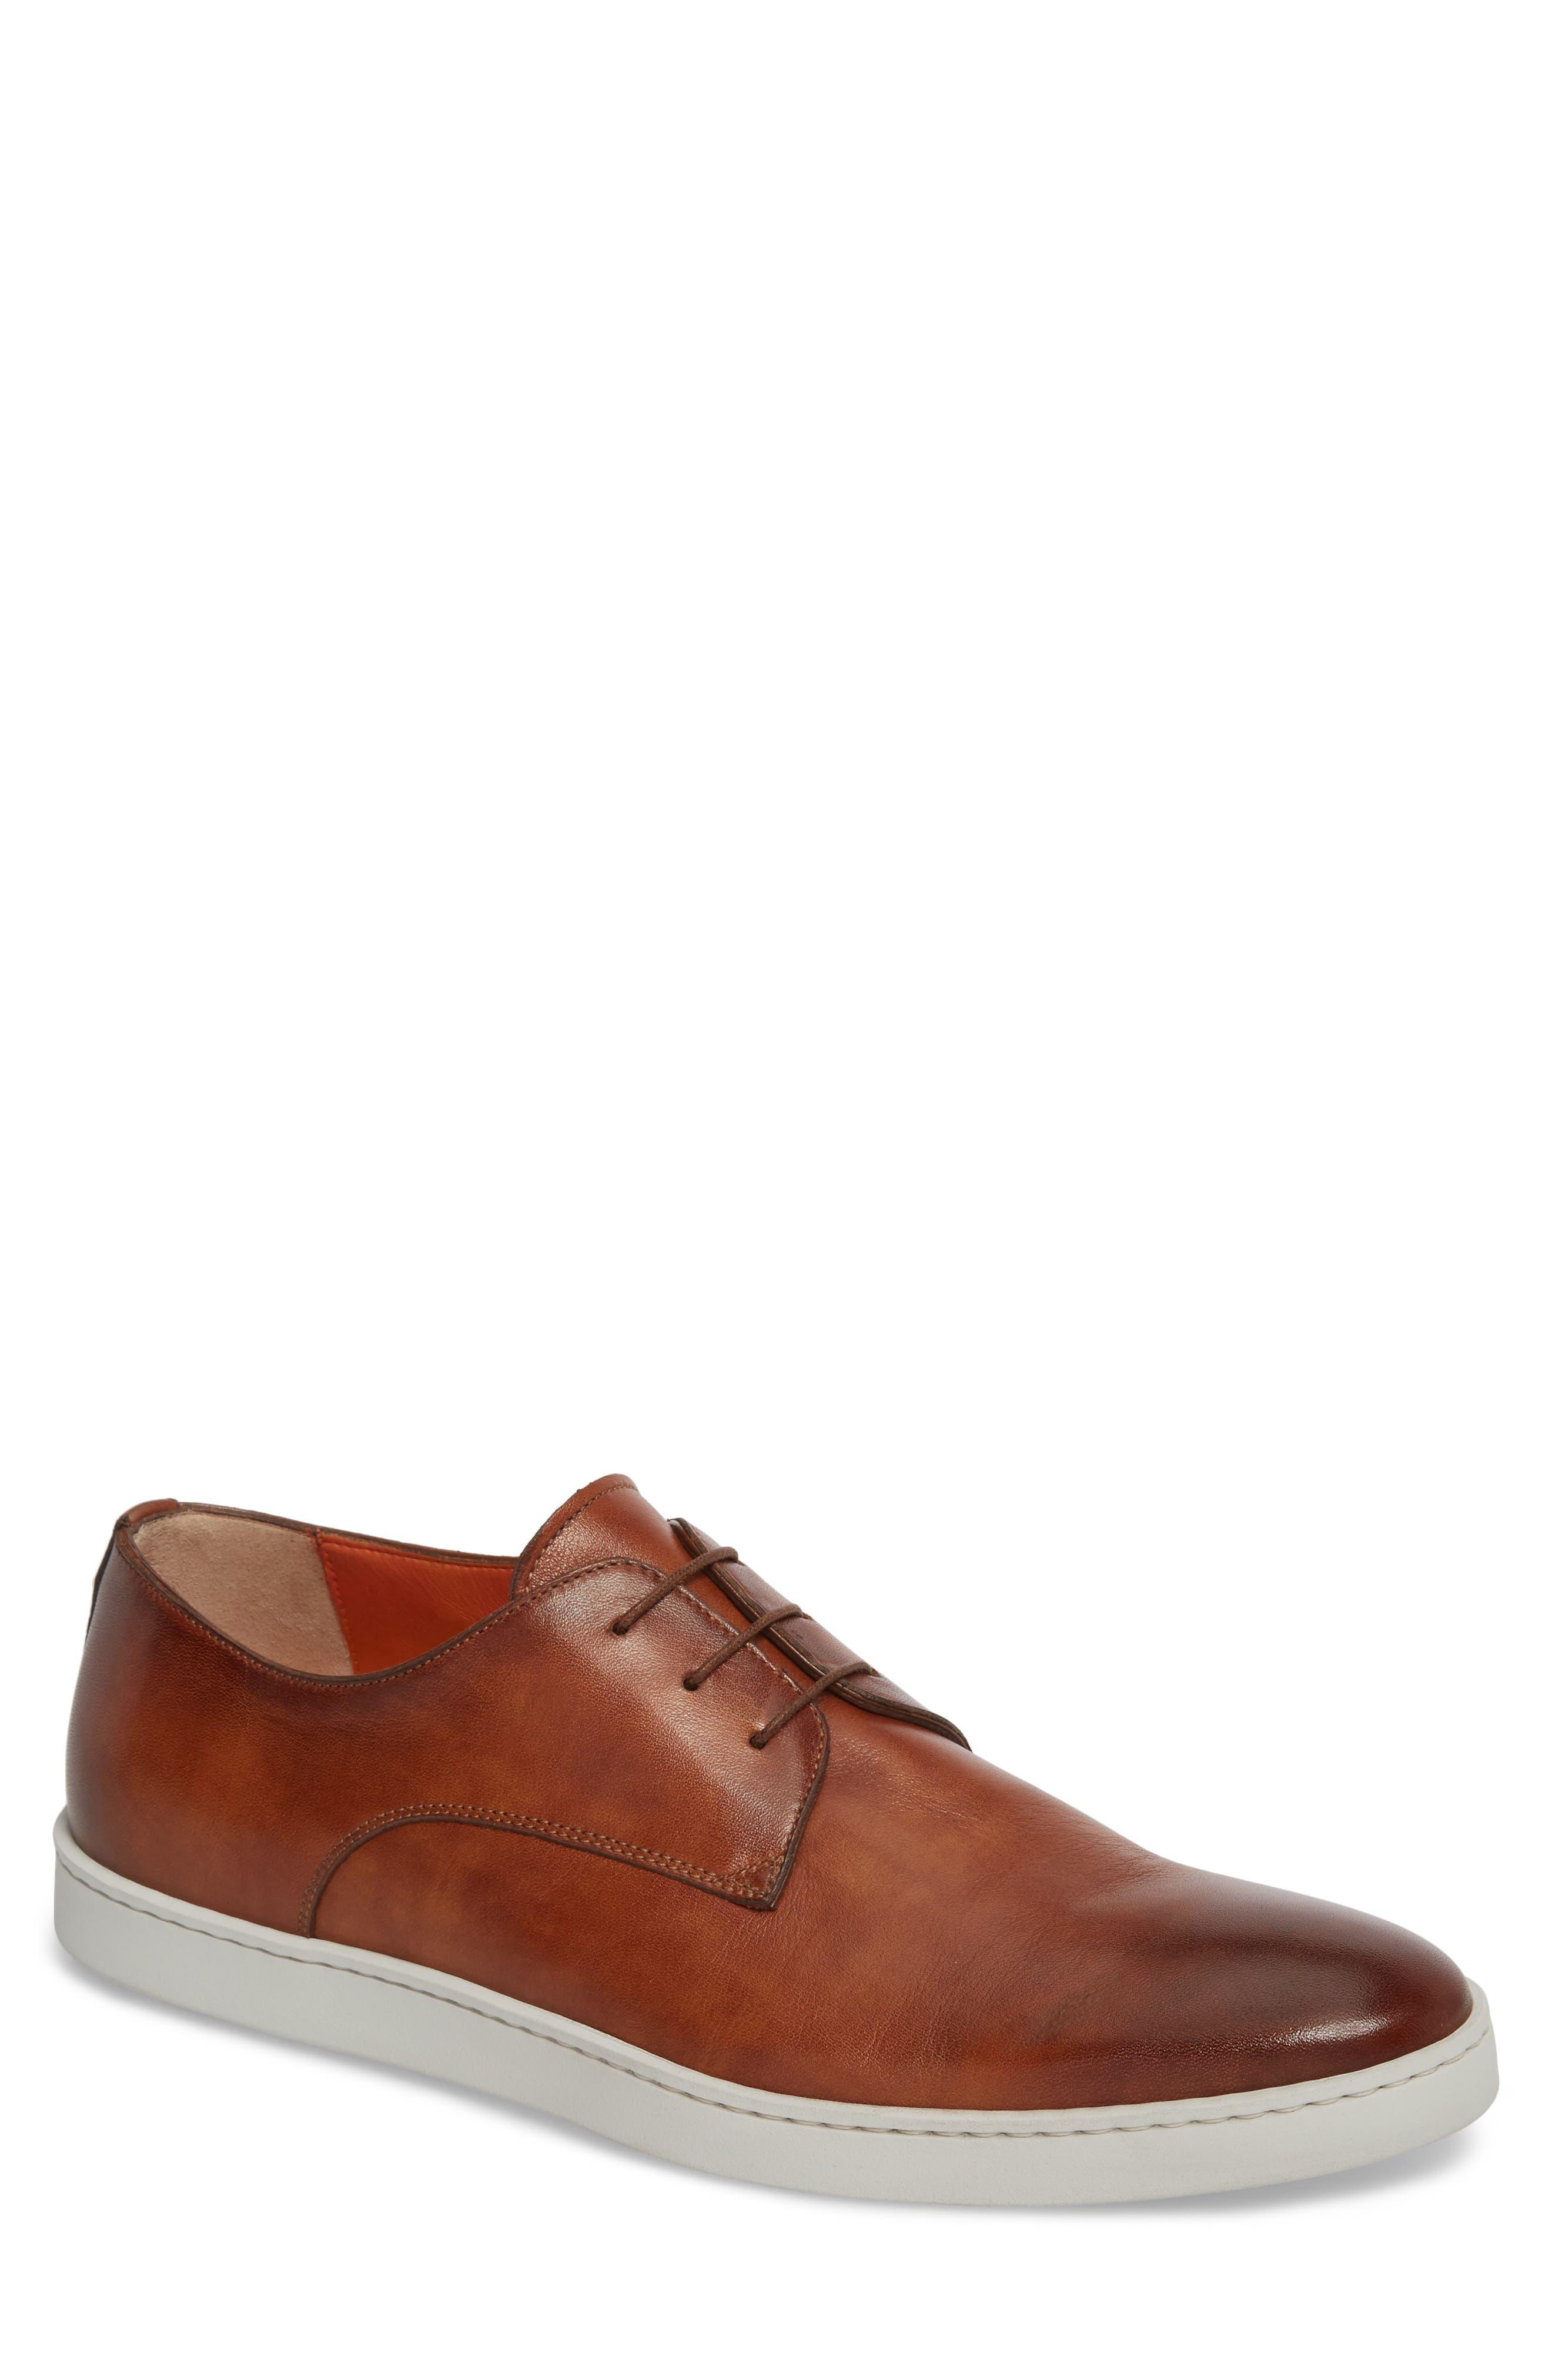 SANTONI Doyle Plain Toe Derby Sneaker, Main, color, TAN